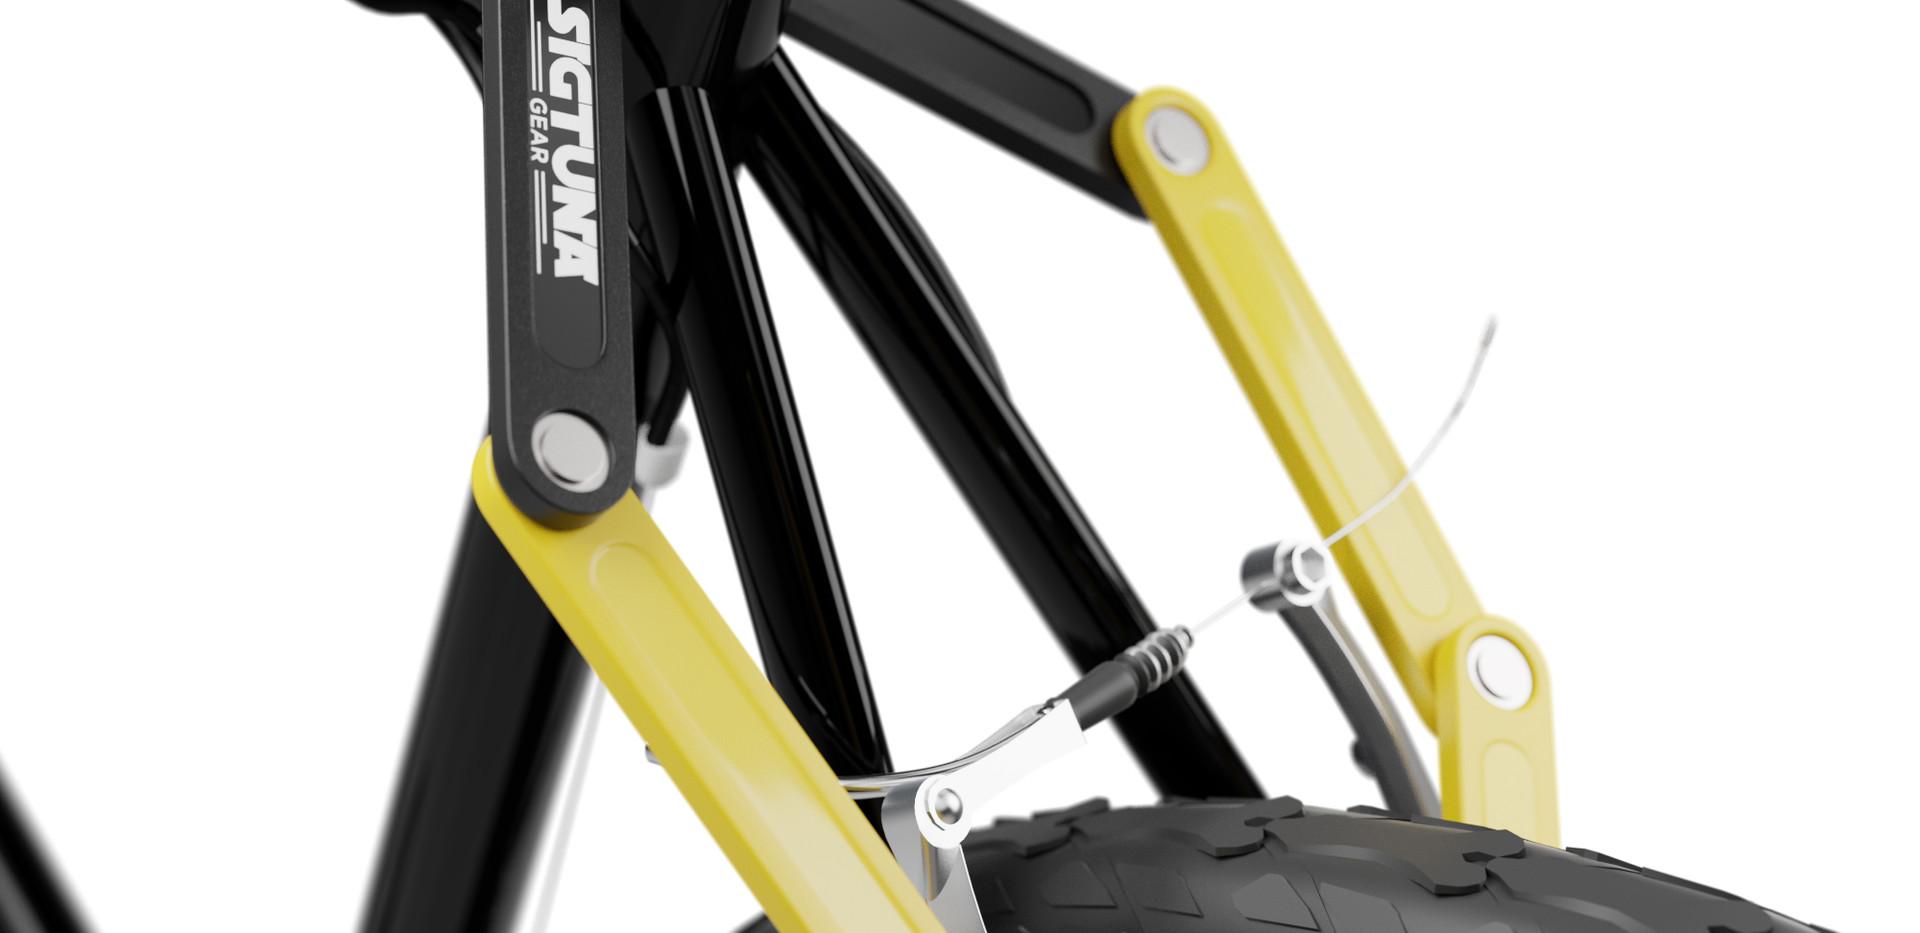 Folding Lock Bike